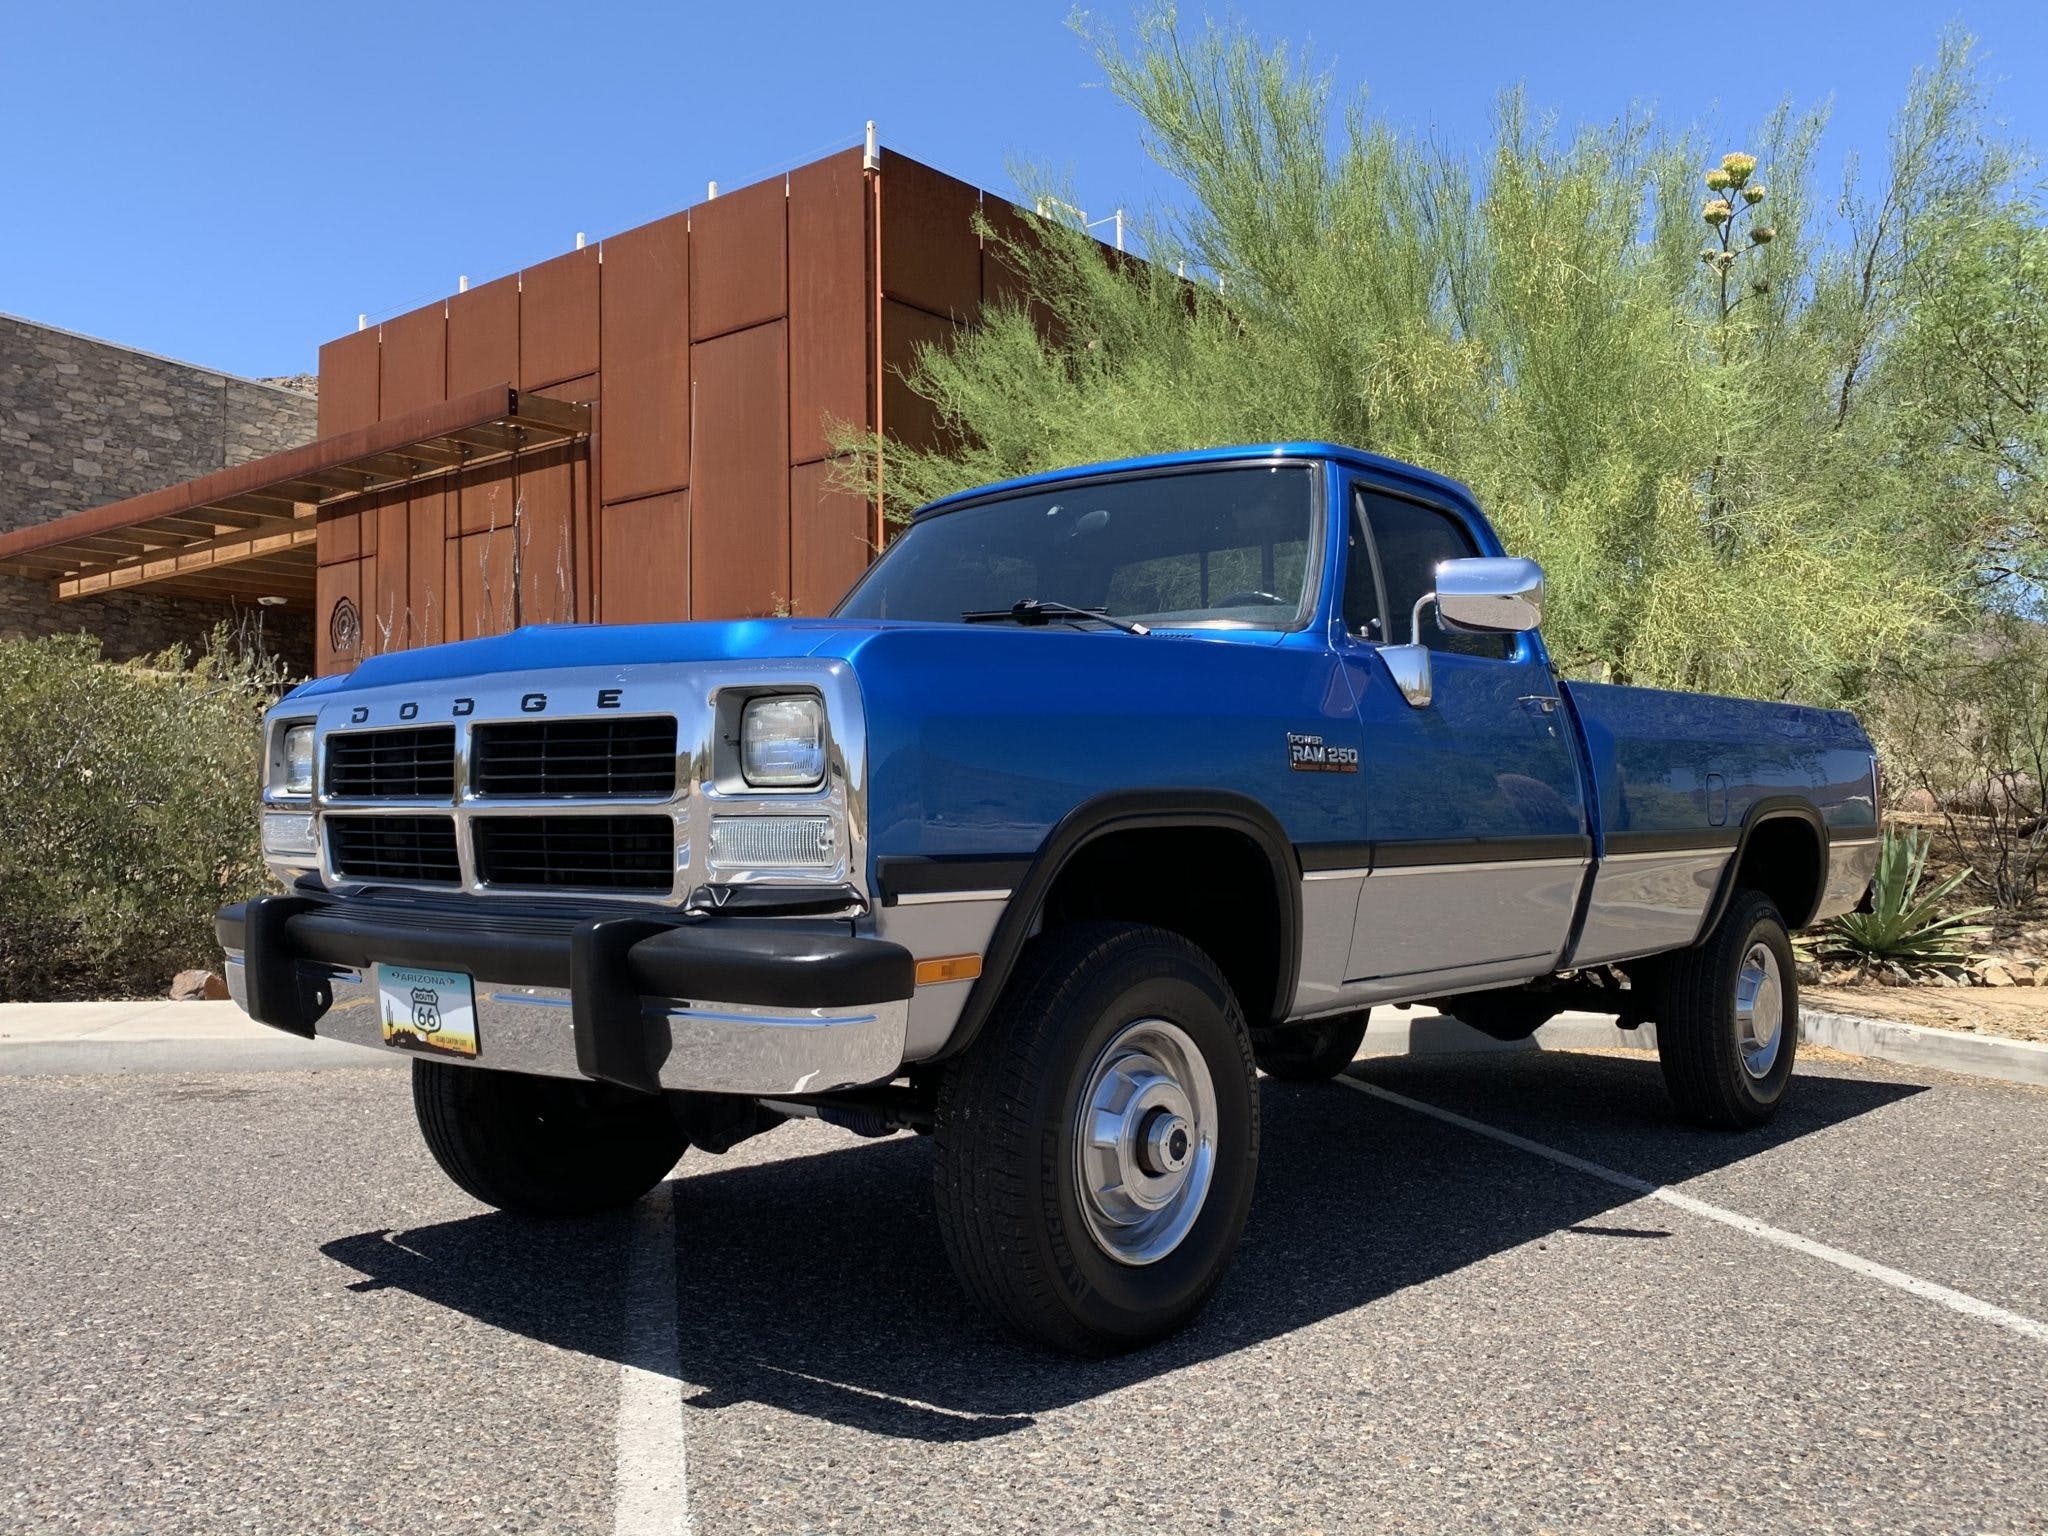 1993 Dodge Power Ram Turbodiesel 250 4×4 5-Speed